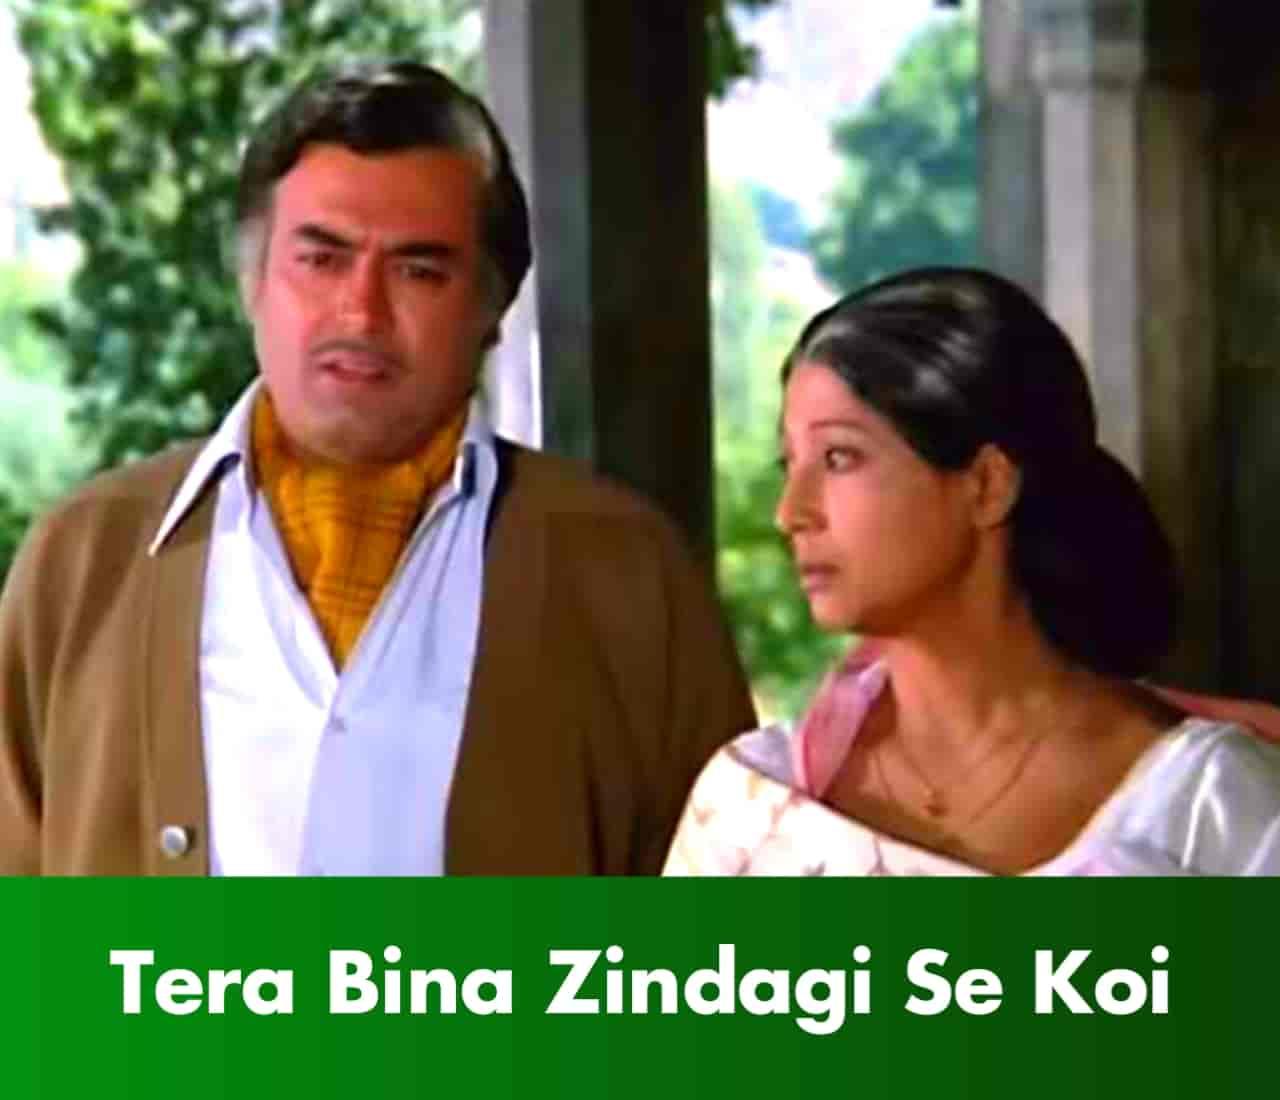 Tera bina zindagi se koi Hindi Sad Song Lyrics, Sung By Lata Mangeshkar and Kishor Kumar.